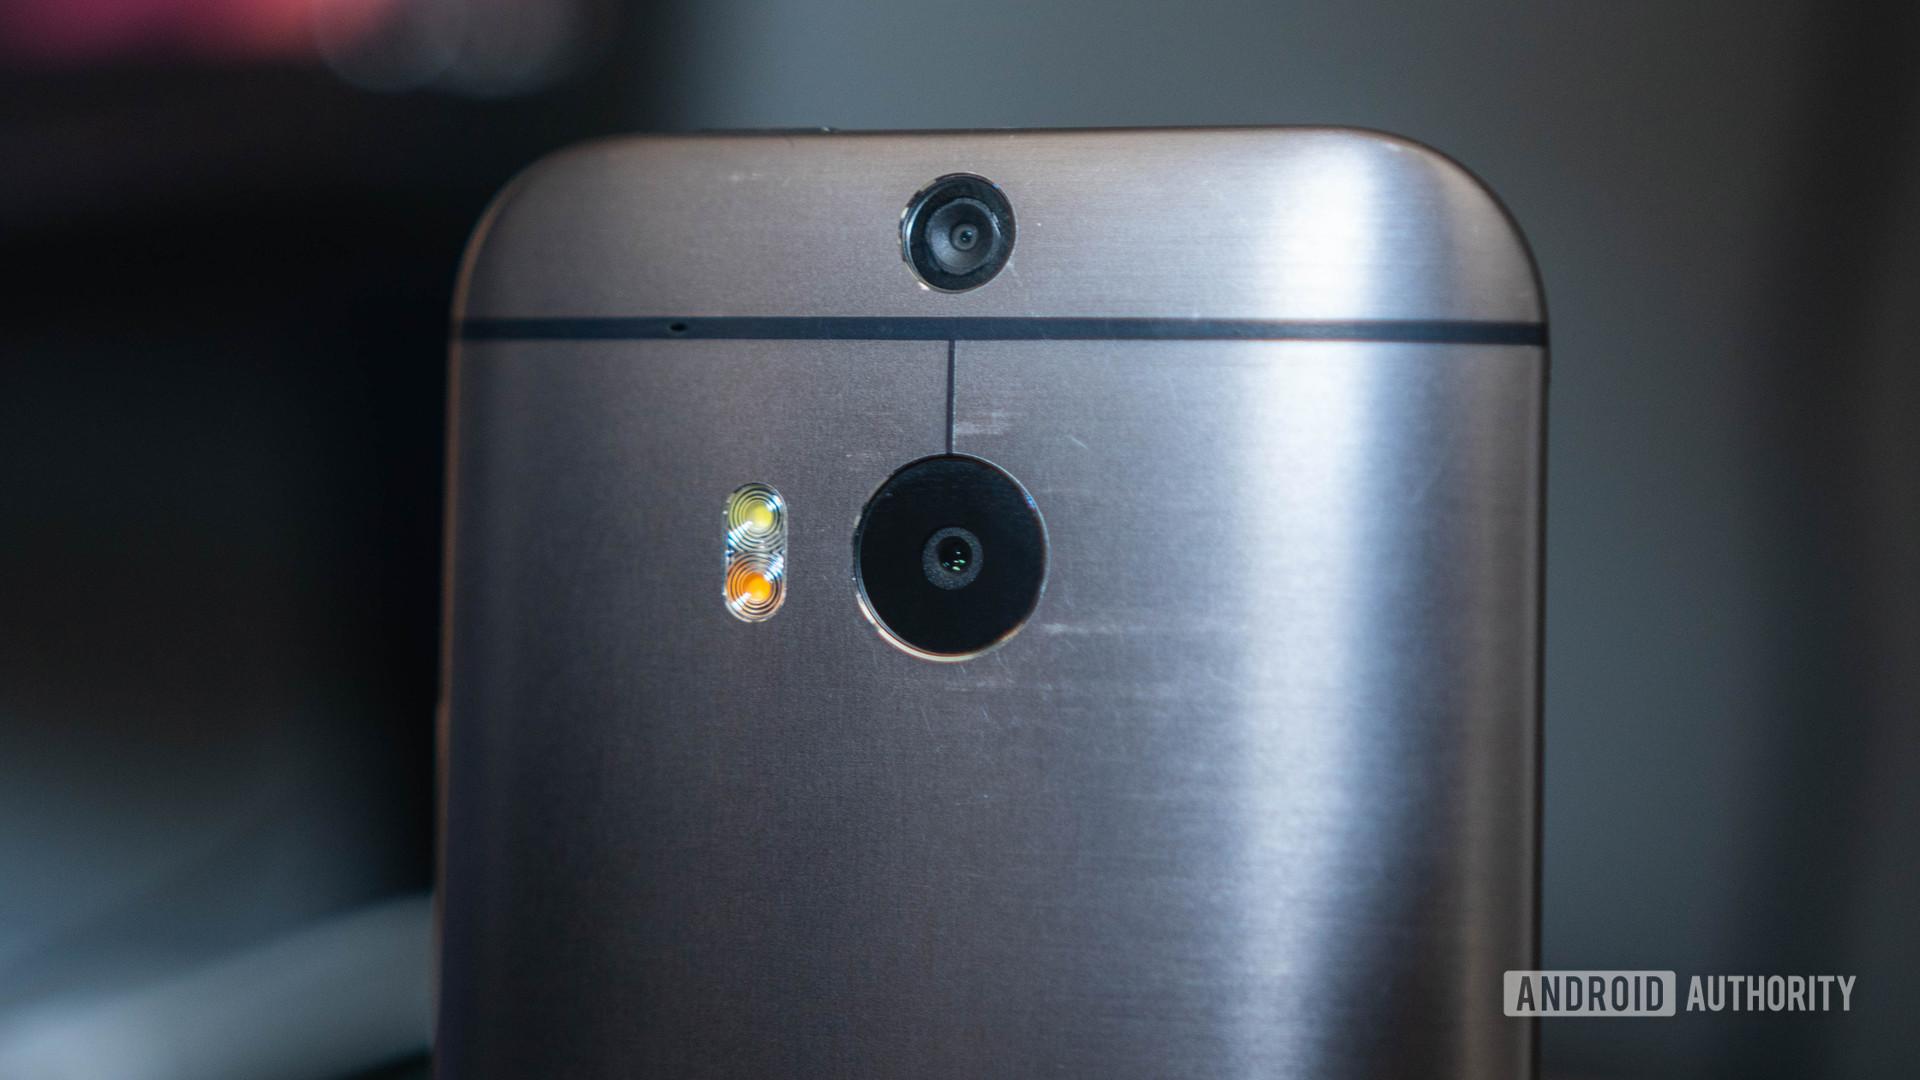 HTC One M8 rear camera shot